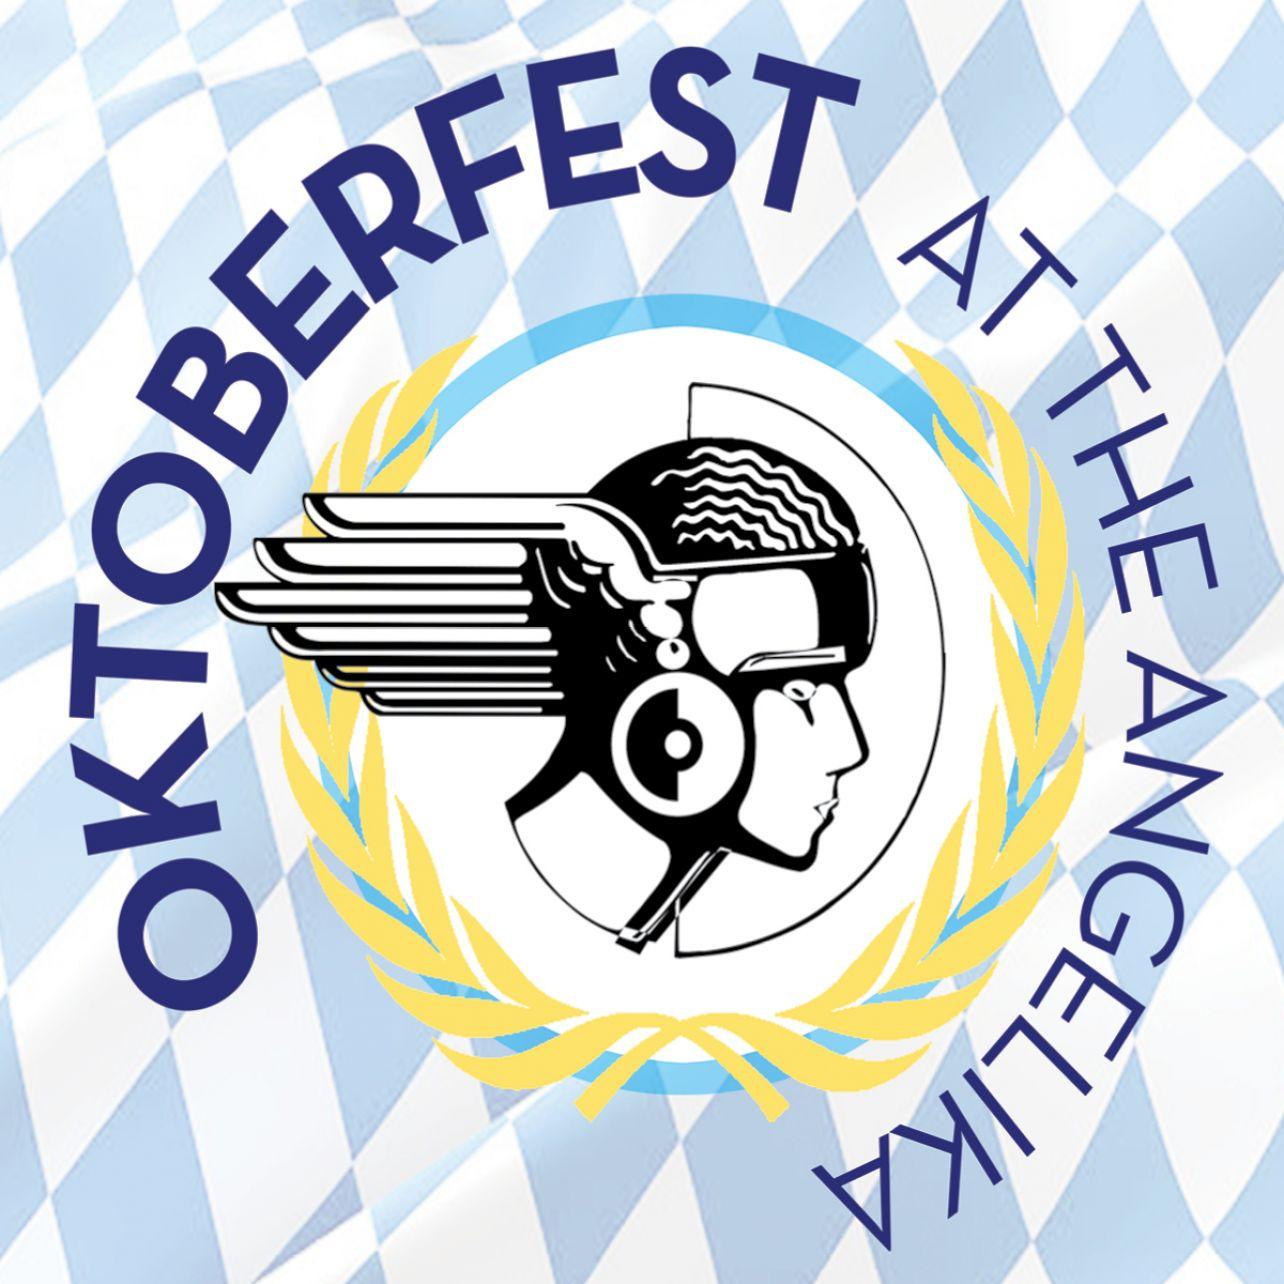 OKTOBERFEST at the Angelika!